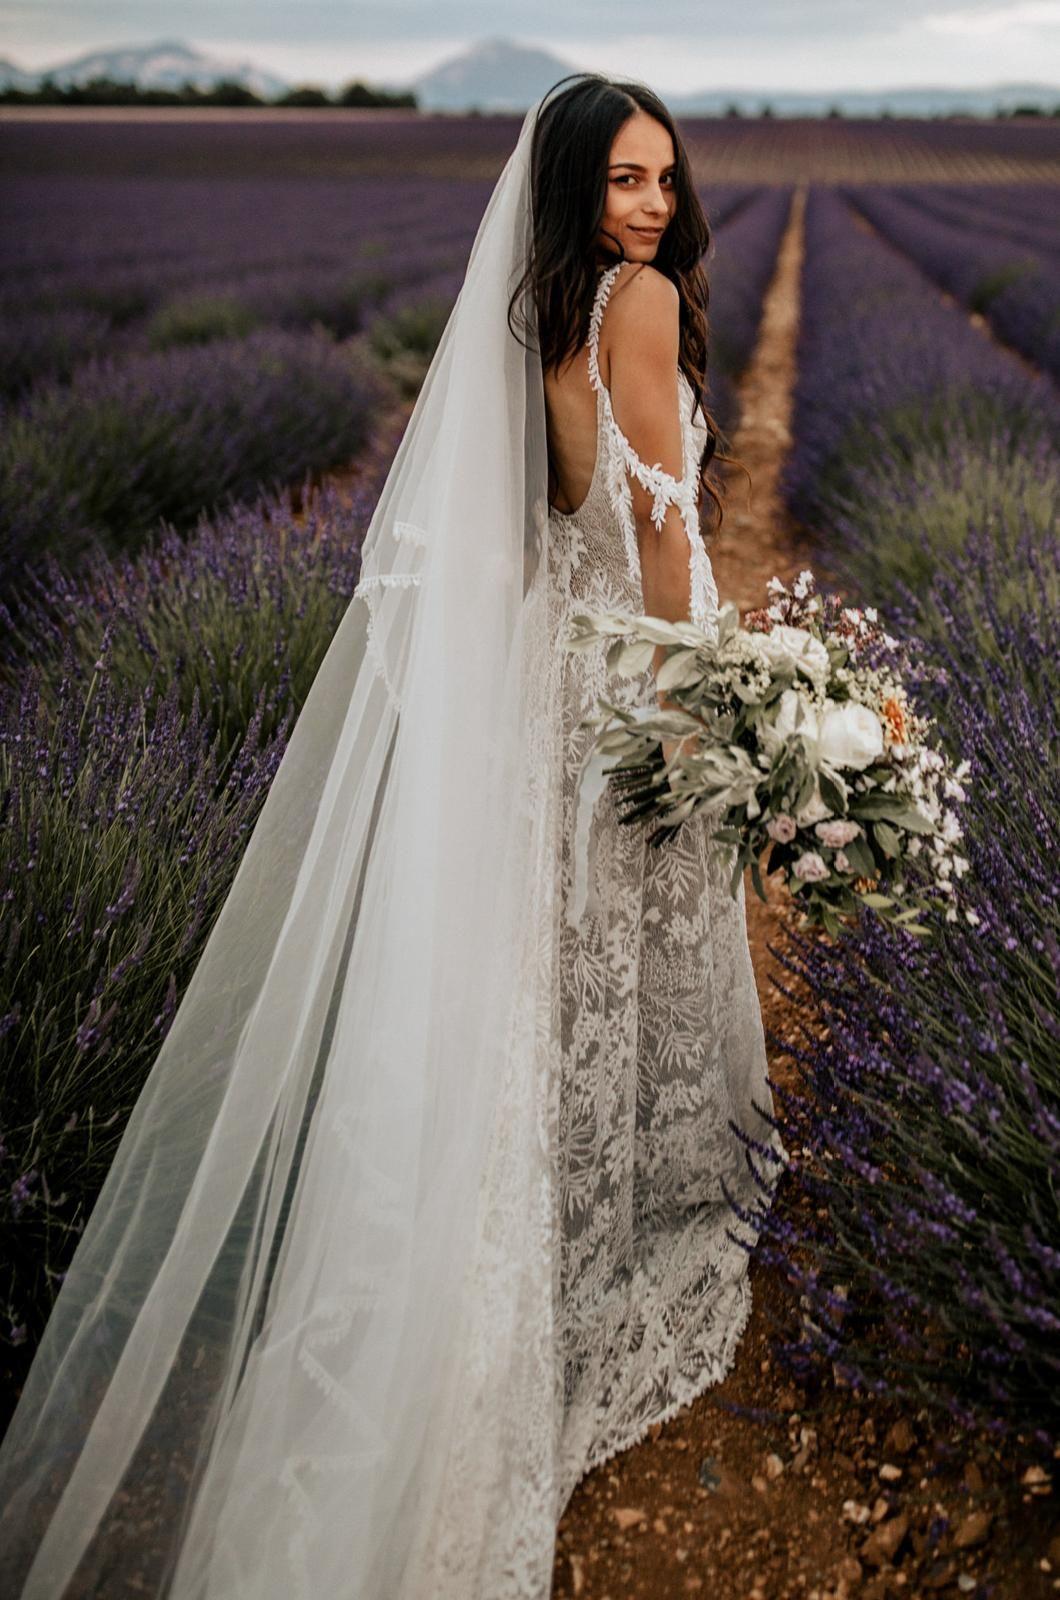 Fox Veil Tulle Bridal Veil With Trim Lace weddings